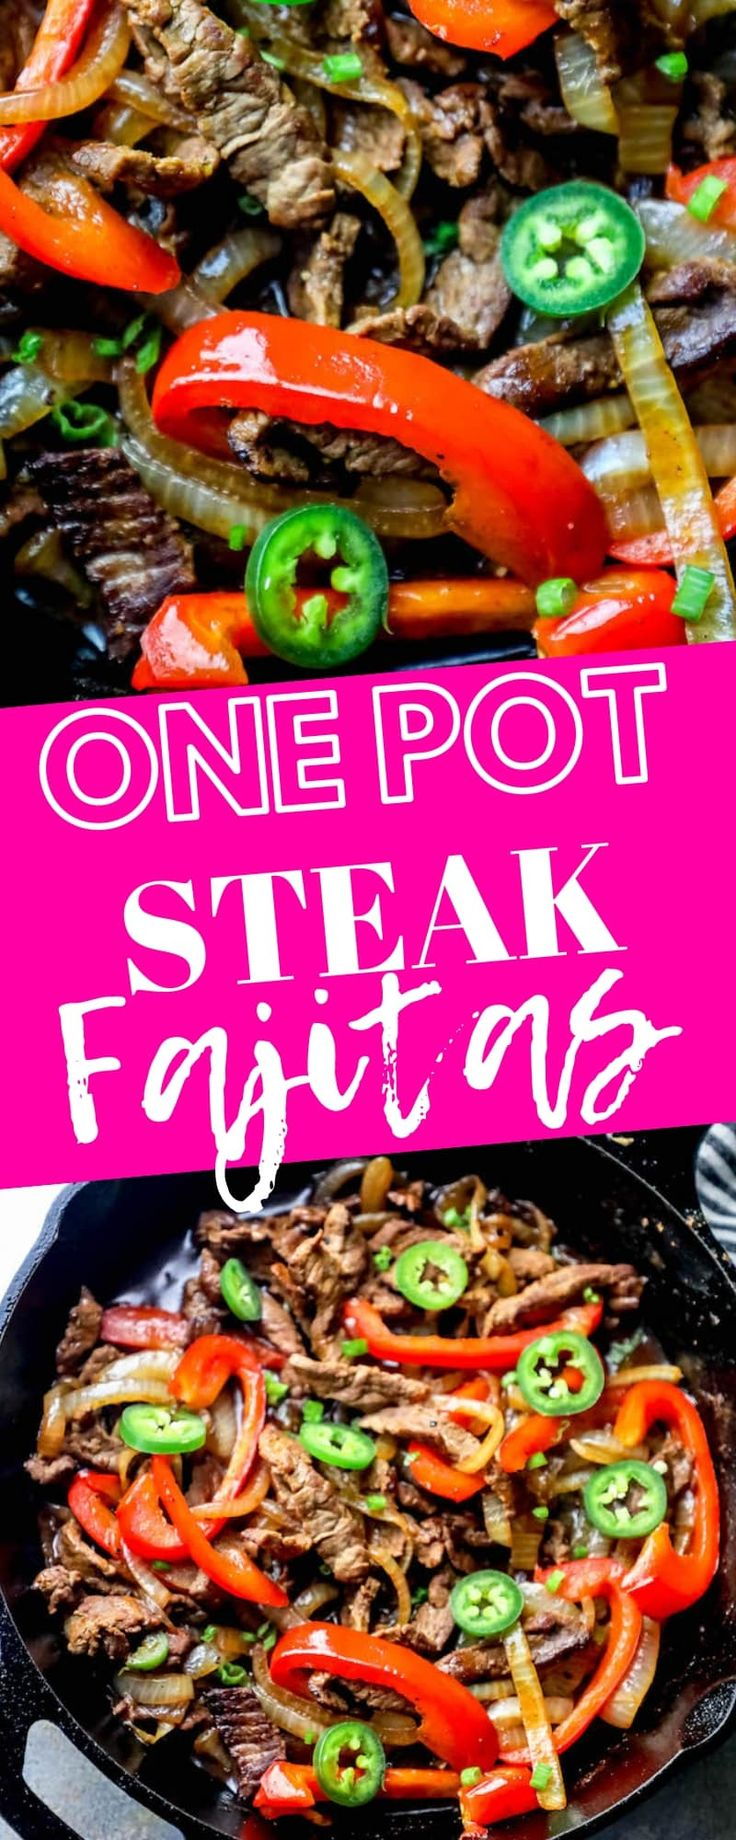 Das beste Eintopf-Steak-Fajitas-Rezept aller Zeiten ⋆ Sweet Cs Designs